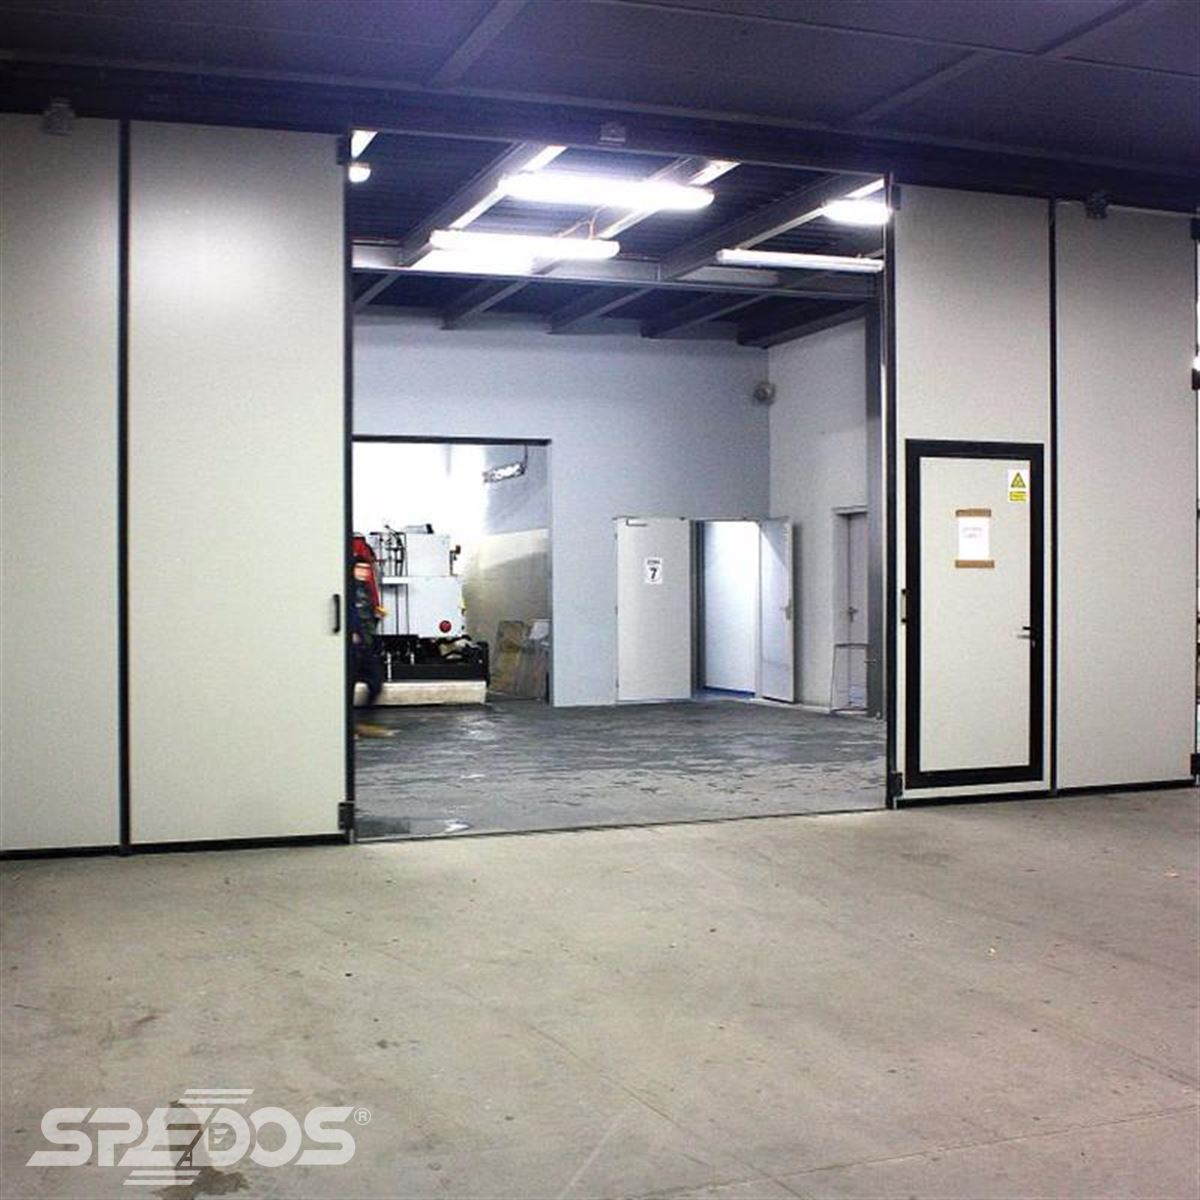 dvoukřídlá skládací vrata Spedos